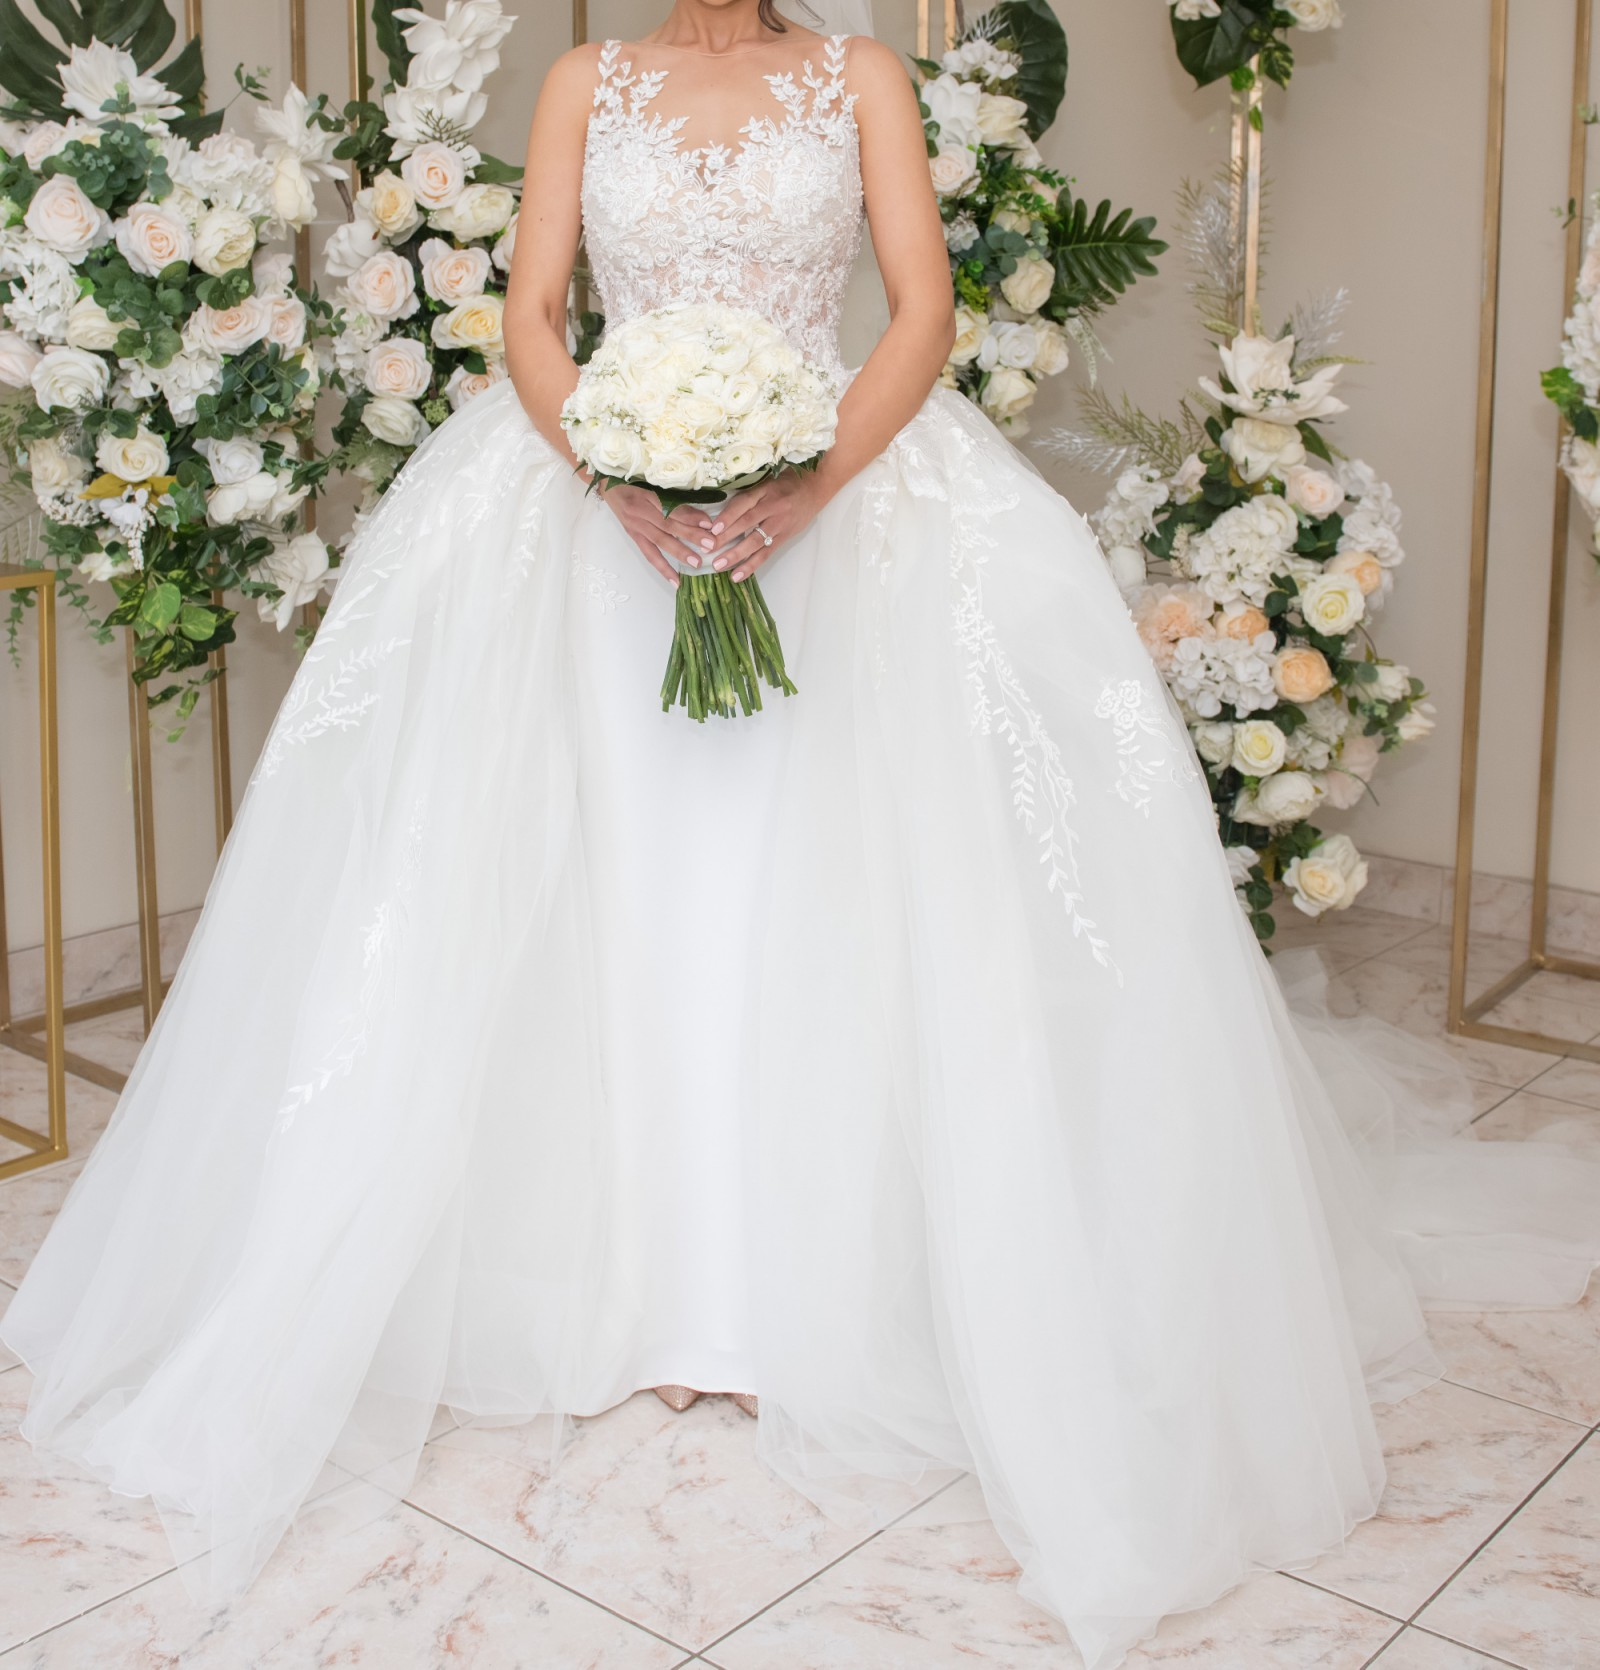 Second Hand Wedding Gown: Demetrios Second Hand Wedding Dress On Sale 57% Off